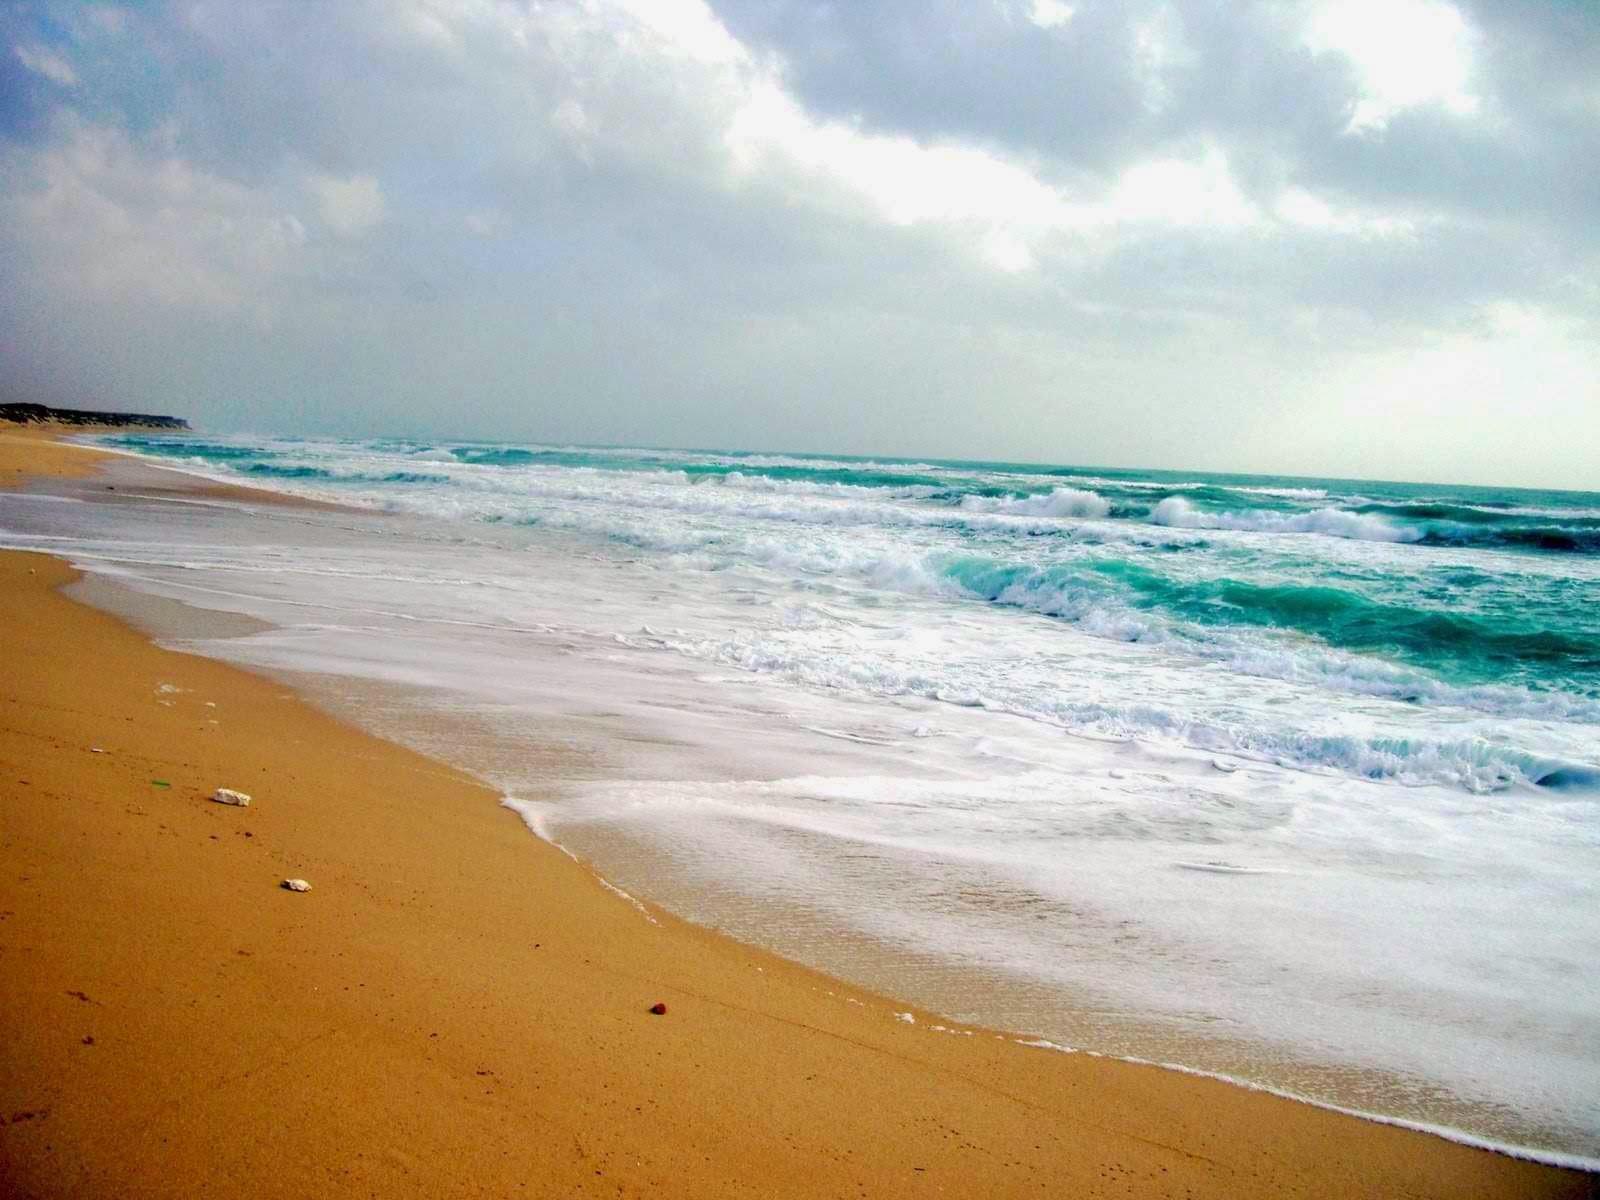 Somalia - worst tourist destination ranked 2nd